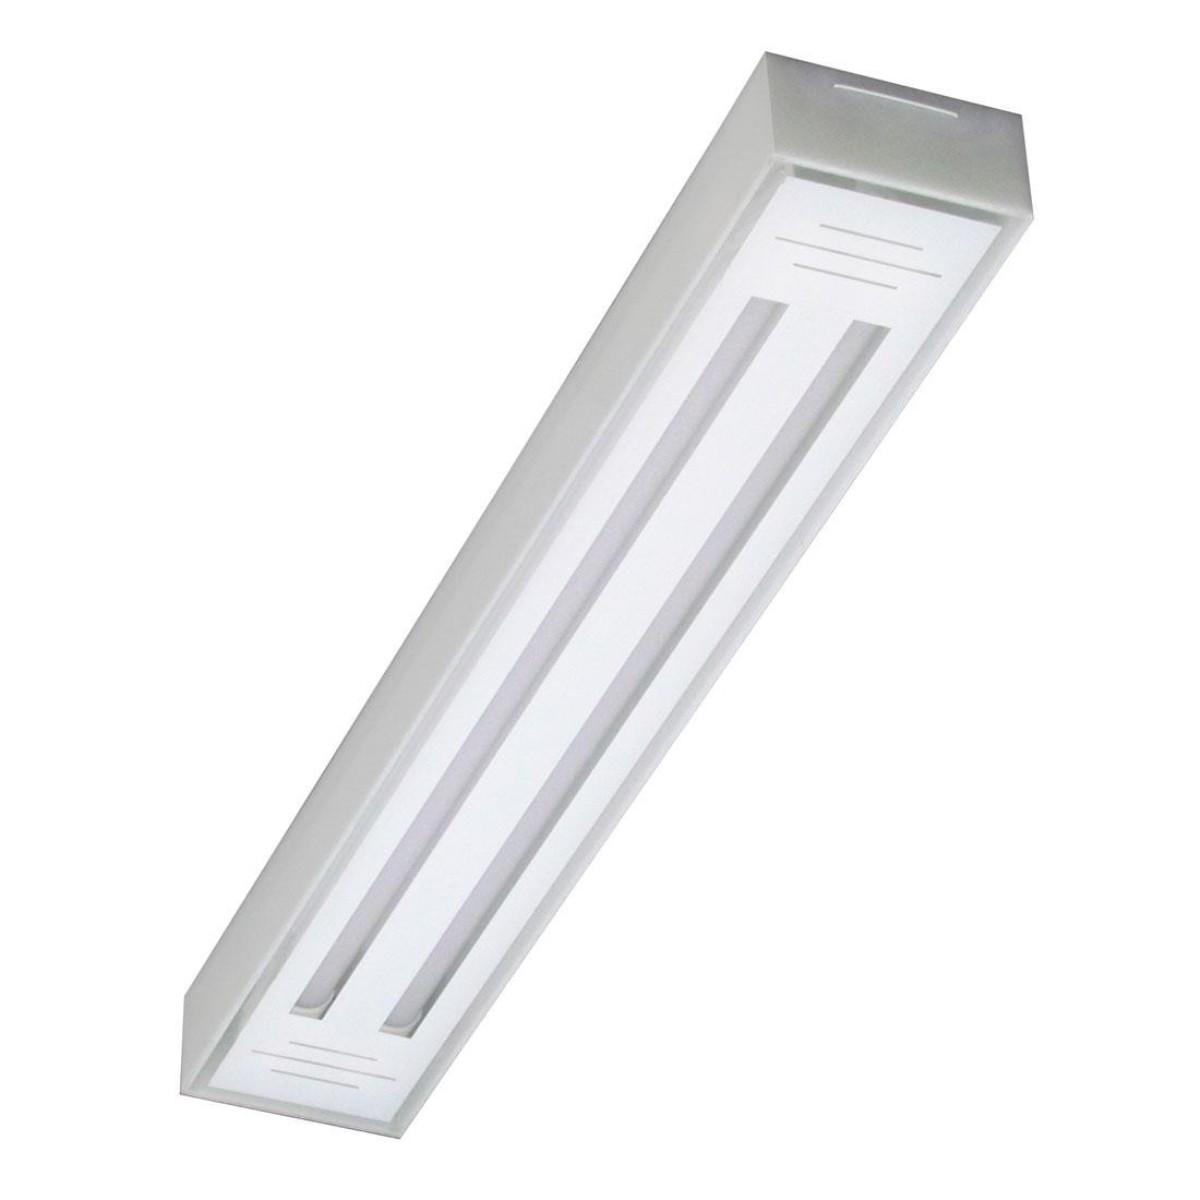 Luminária Led Tube 2x60 Sobrepor Valencia 6500k Tualux